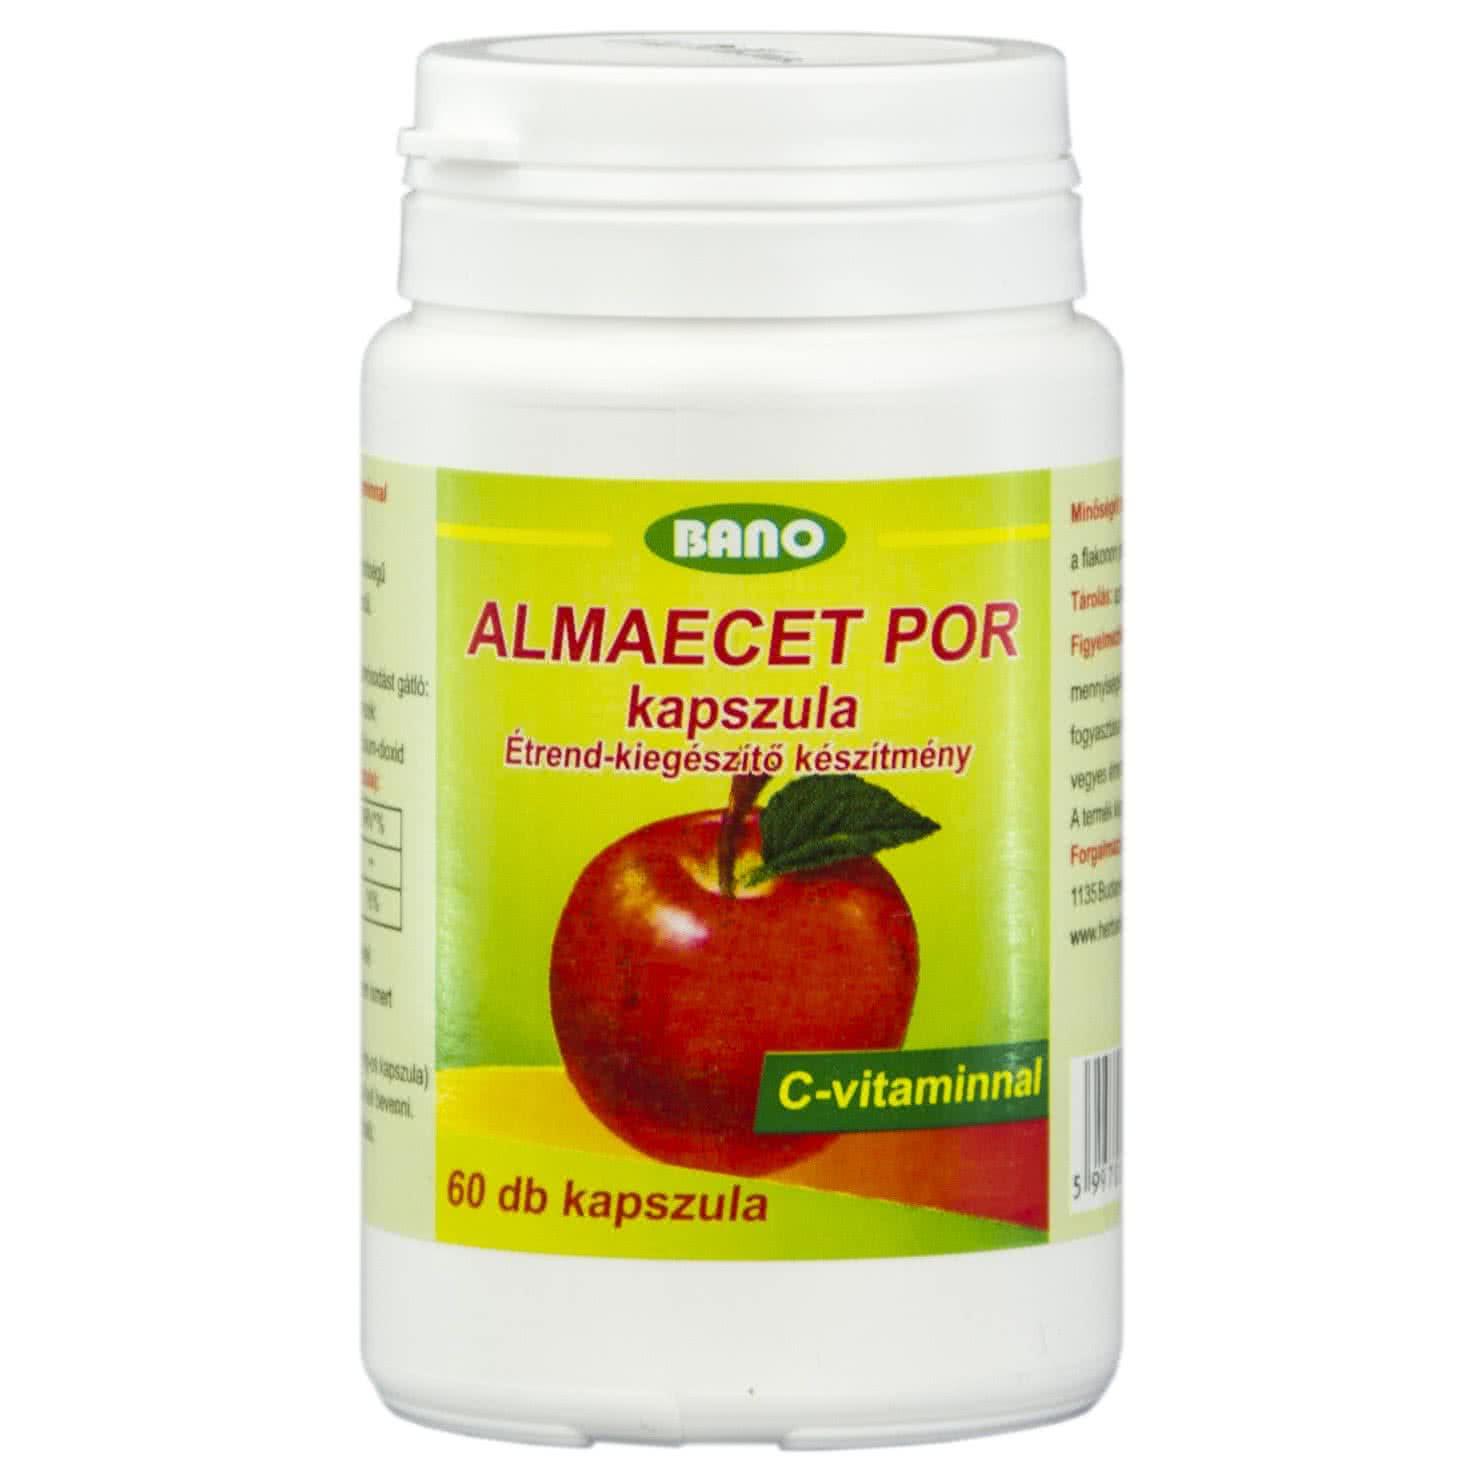 Bano Apple Cider Vinegar Caps 60 kap.